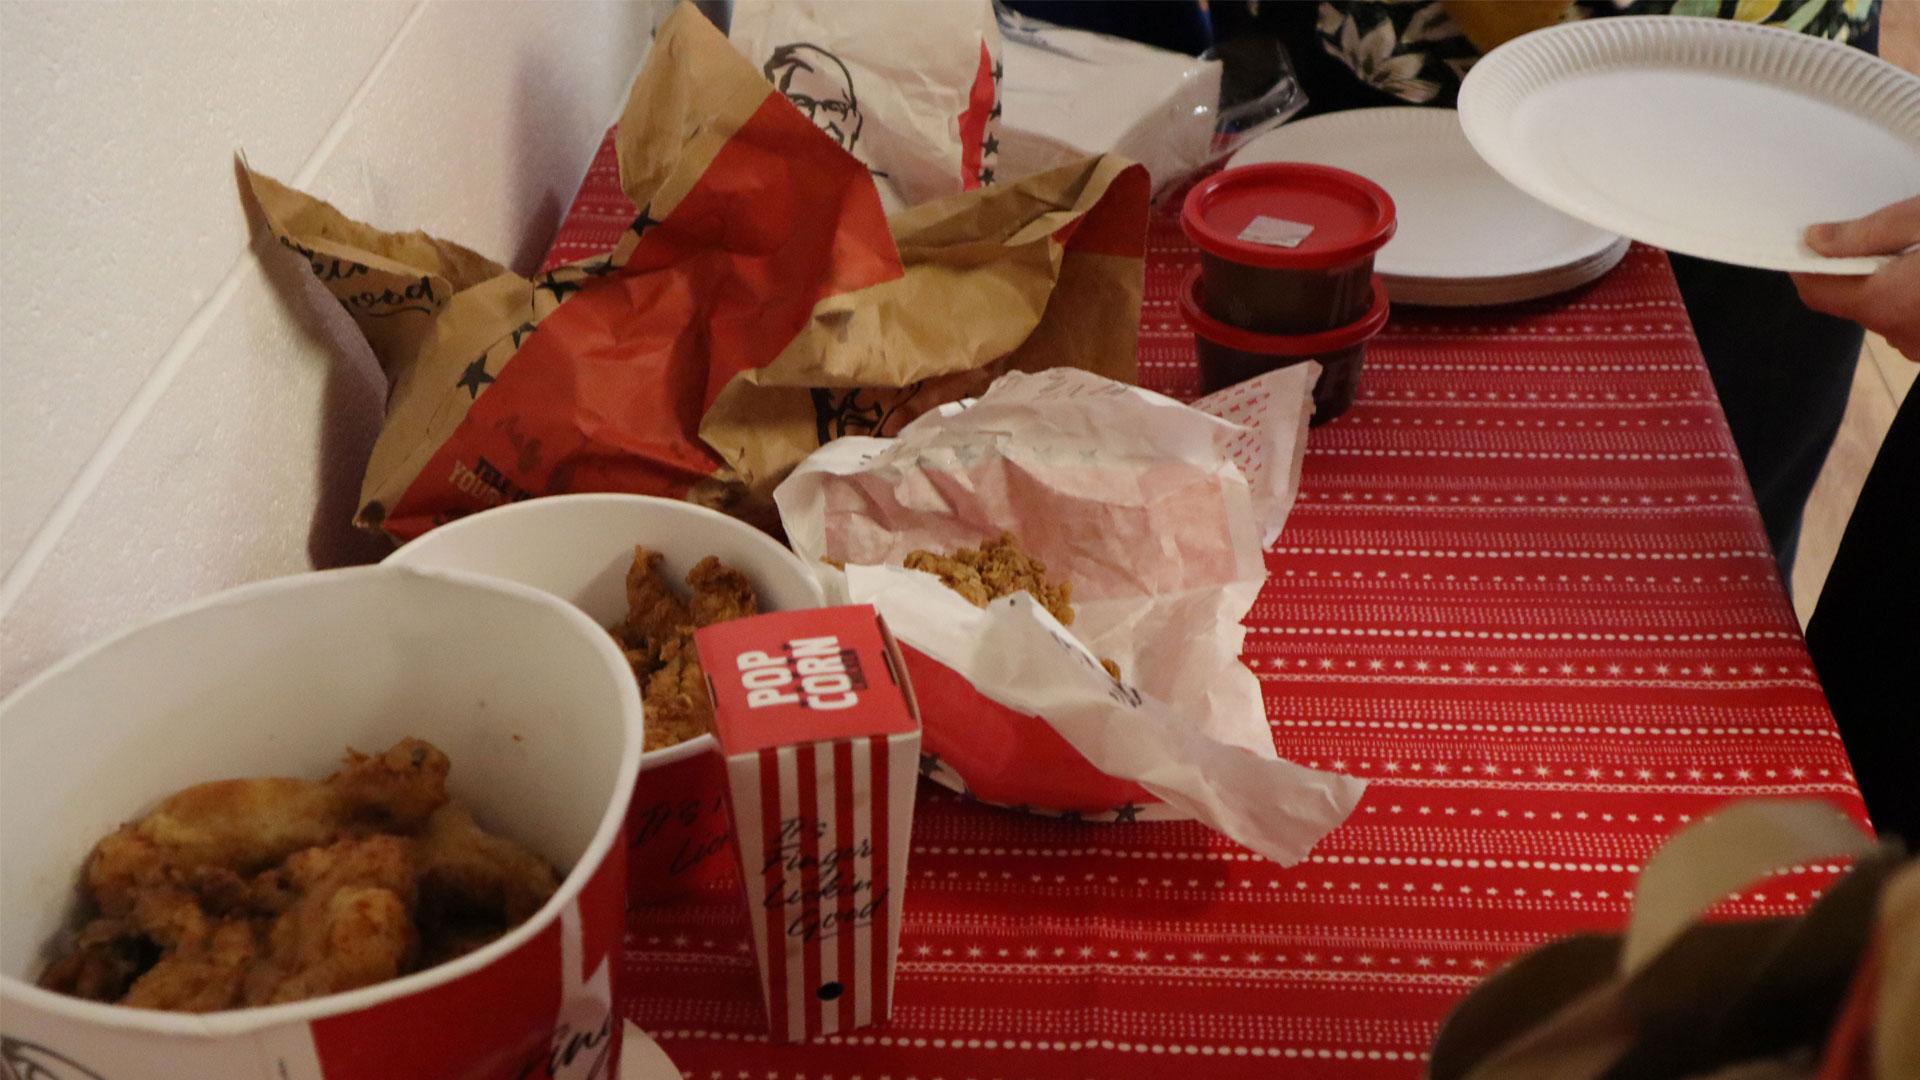 KFC at Liverpoolmoneyman